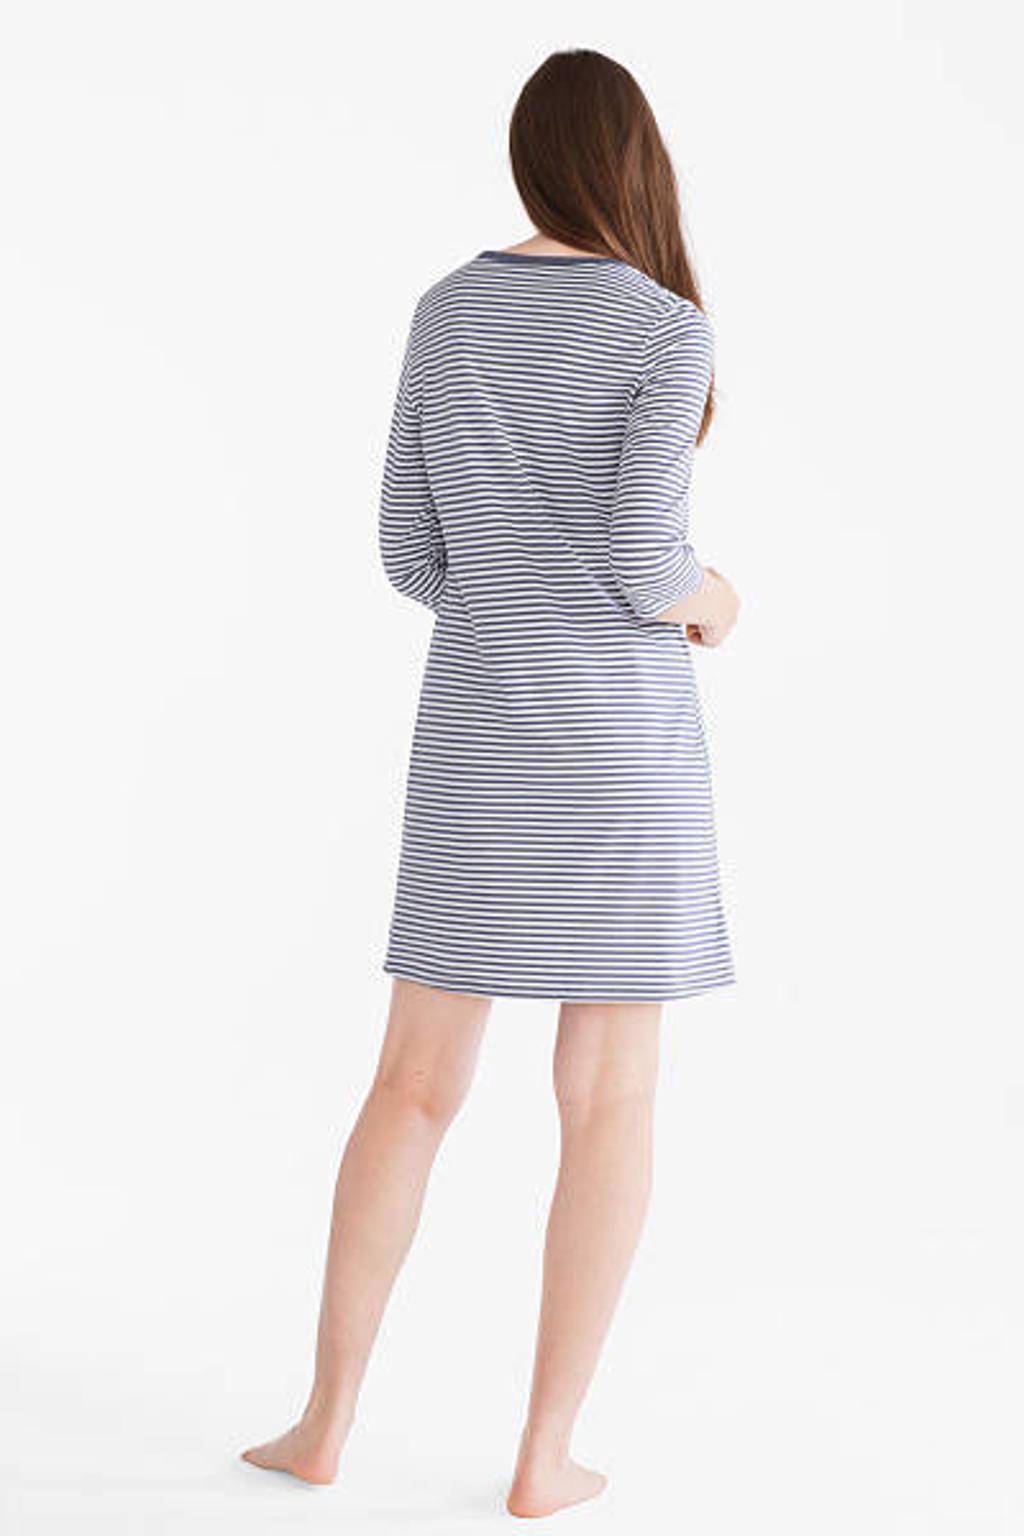 C&A gestreept nachthemd grijs/wit, Grijs/wit